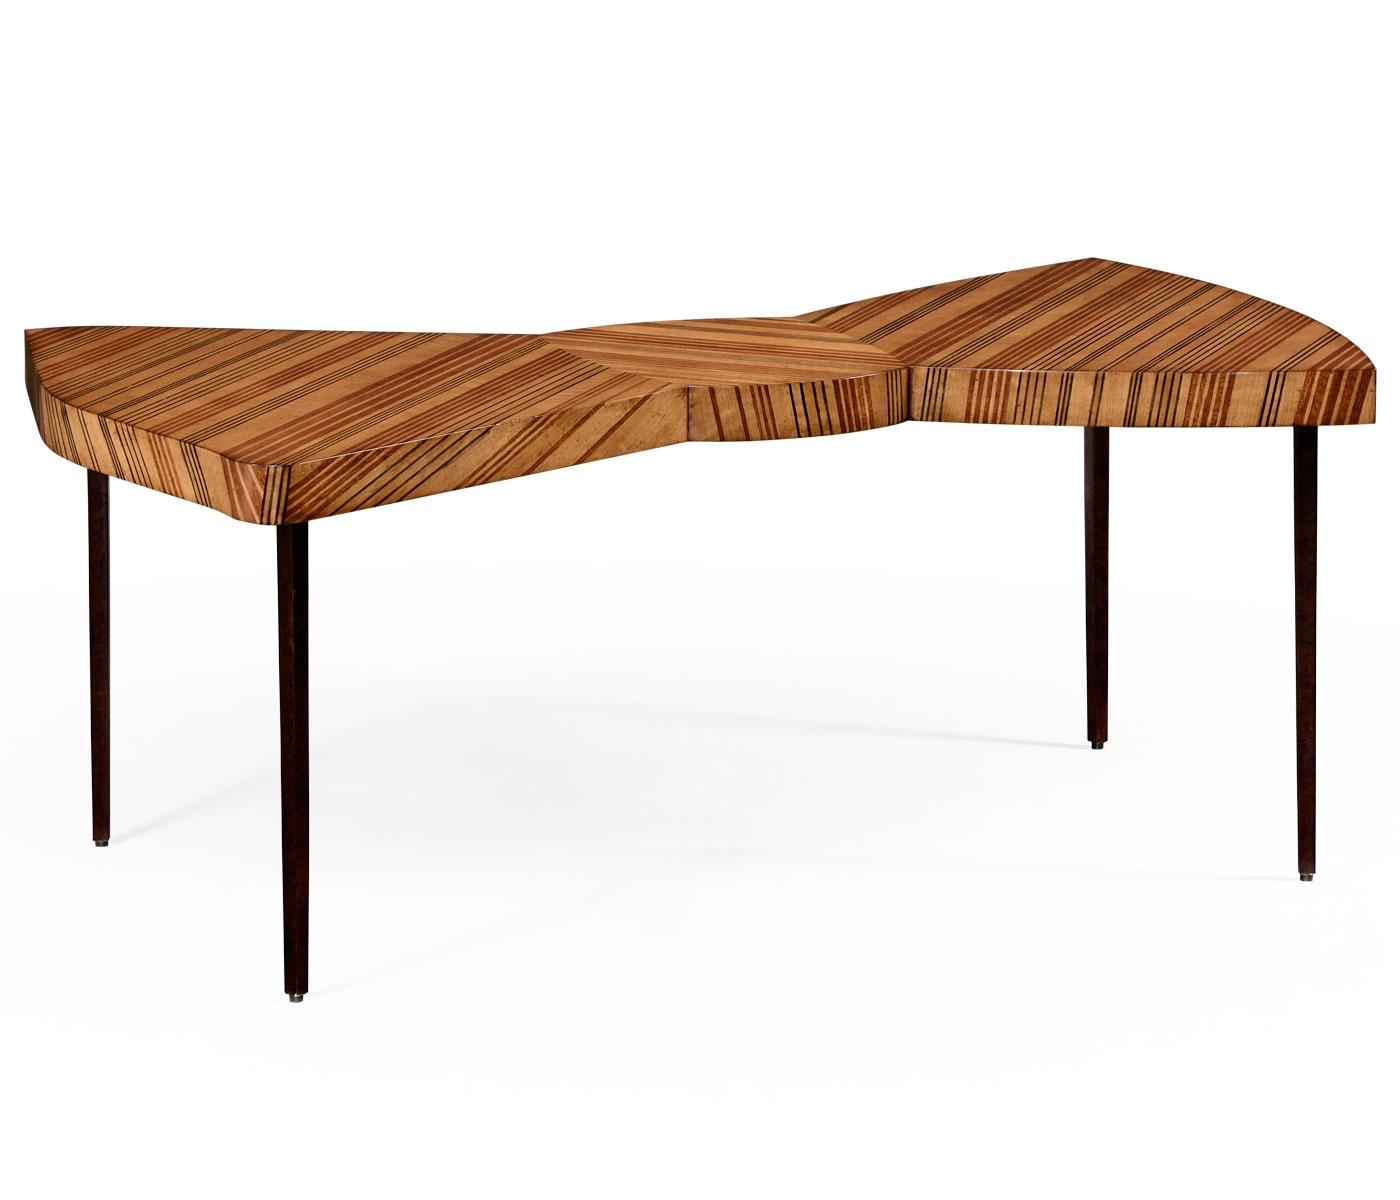 Jordan Alexander Interior Design Furniture ~ Designer bow tie coffee table swanky interiors